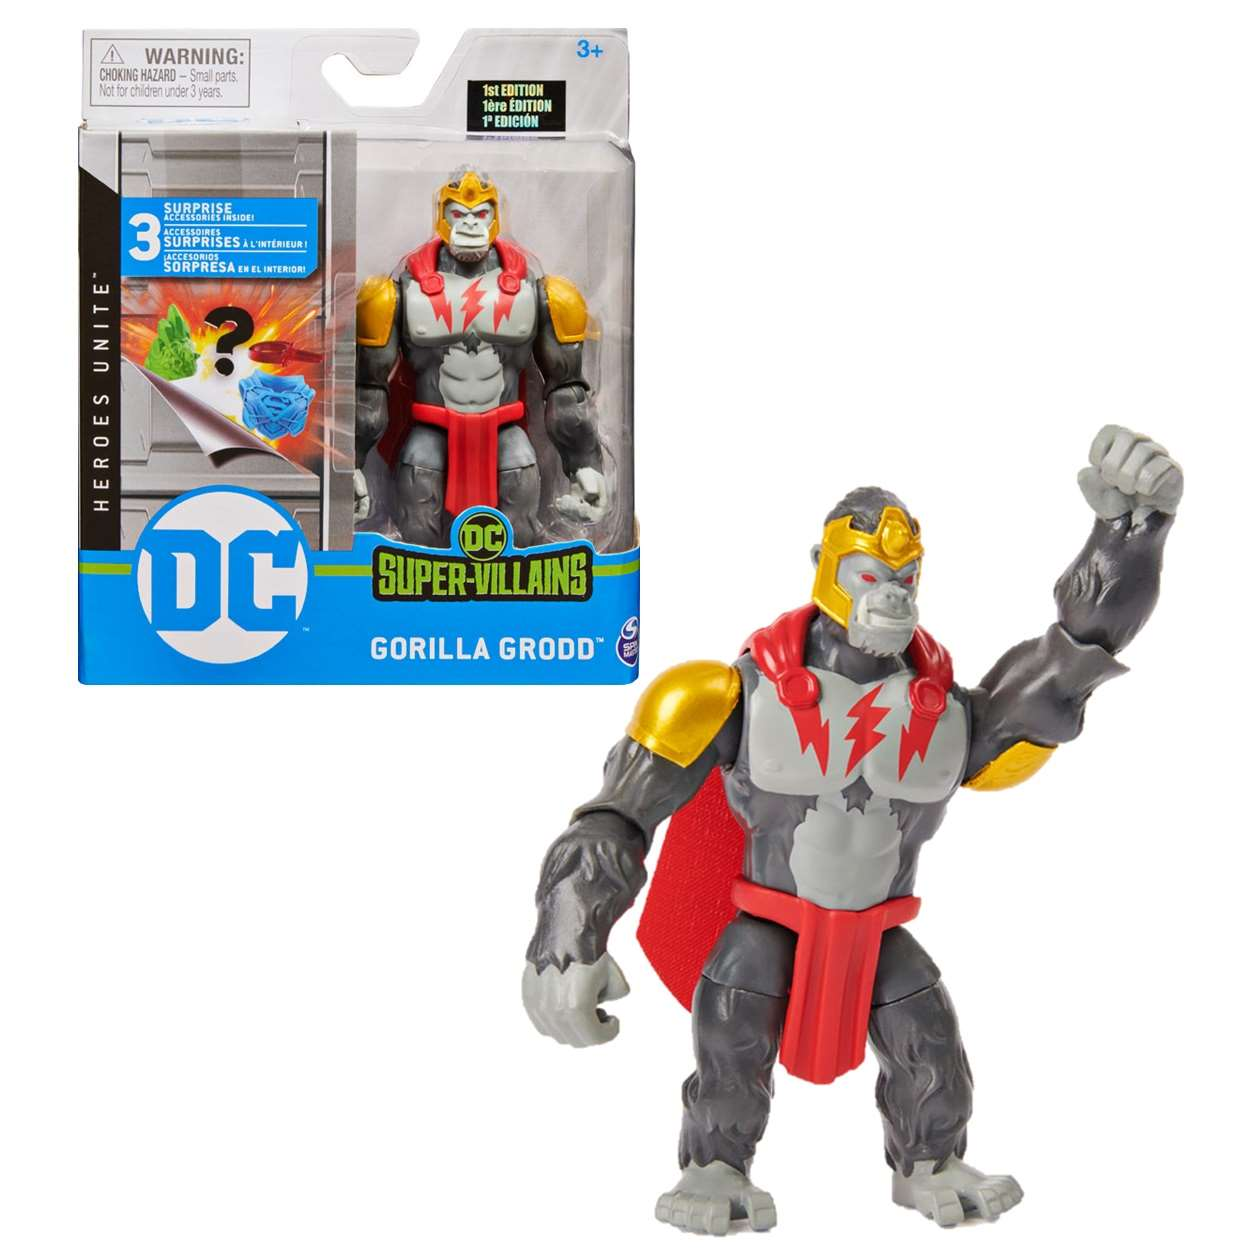 Gorilla Grodd Figura Heroes Unite Super Villains Spin Master